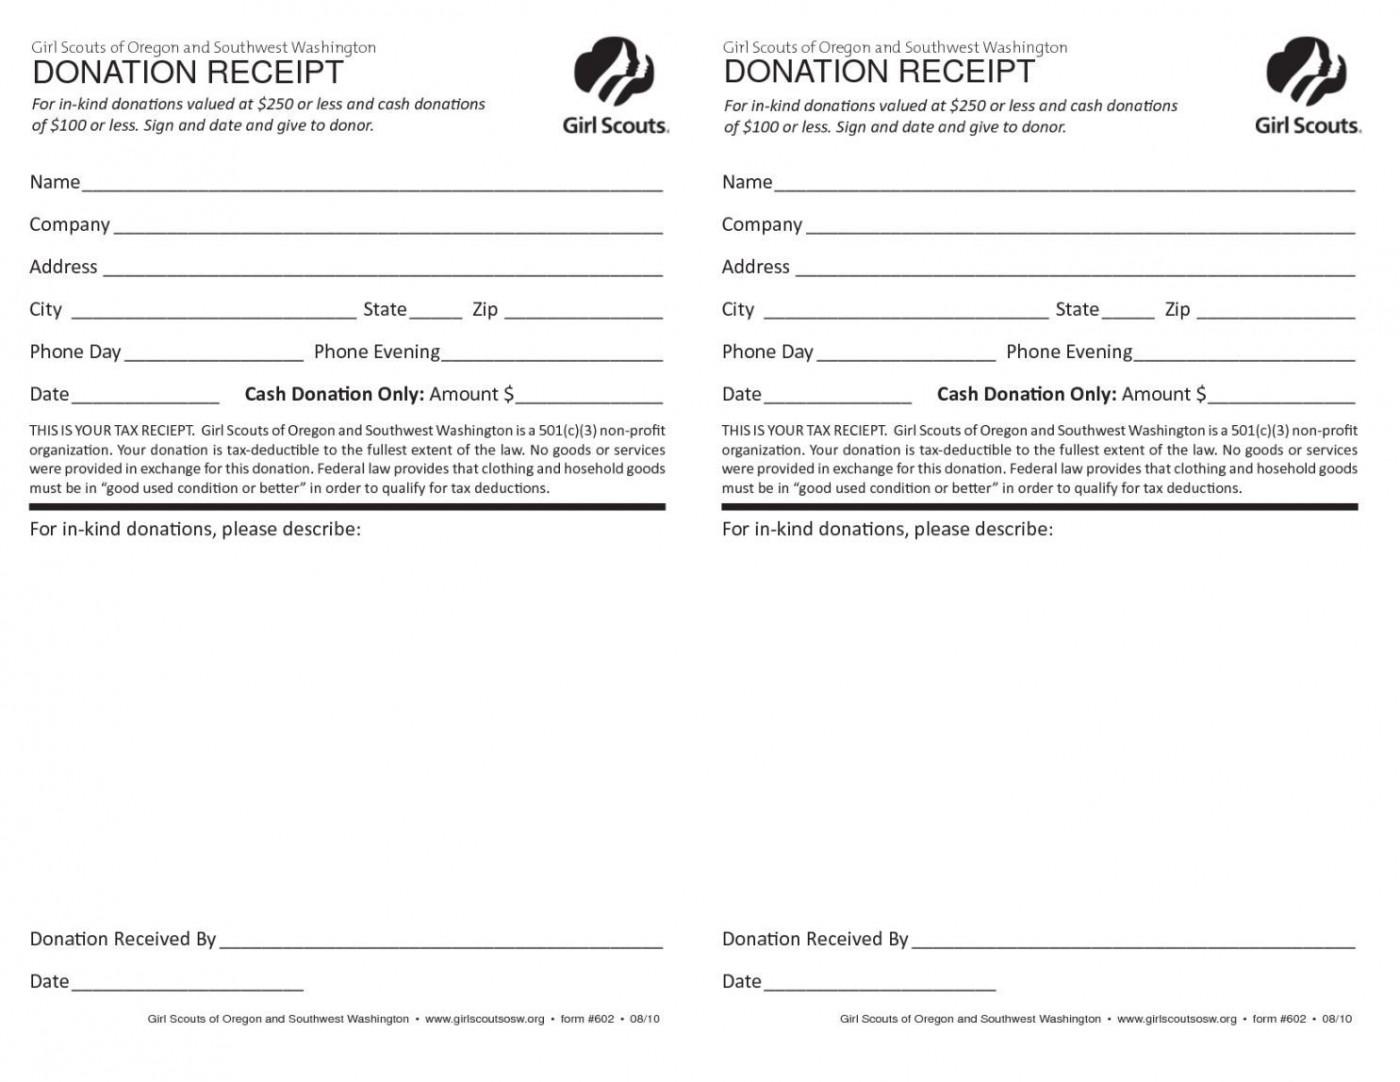 005 Wonderful Tax Deductible Donation Receipt Template Australia Image 1400